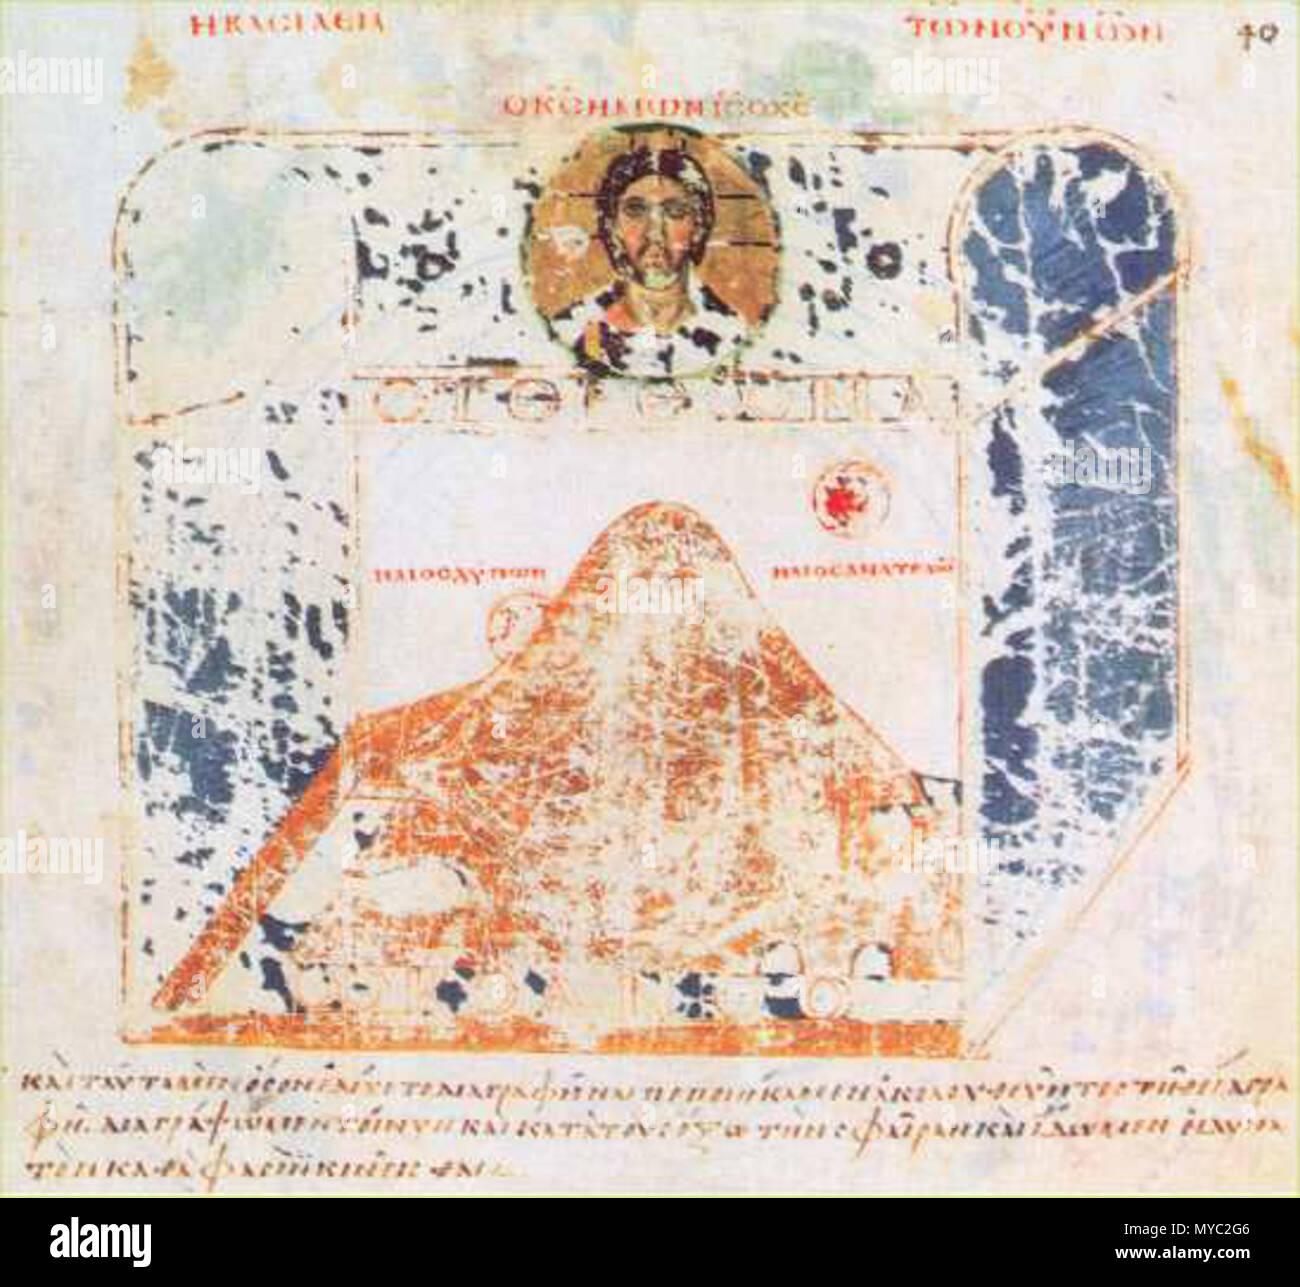 124 Cosmas Indicopleustes - Topographia Christiana 1 - Stock Image